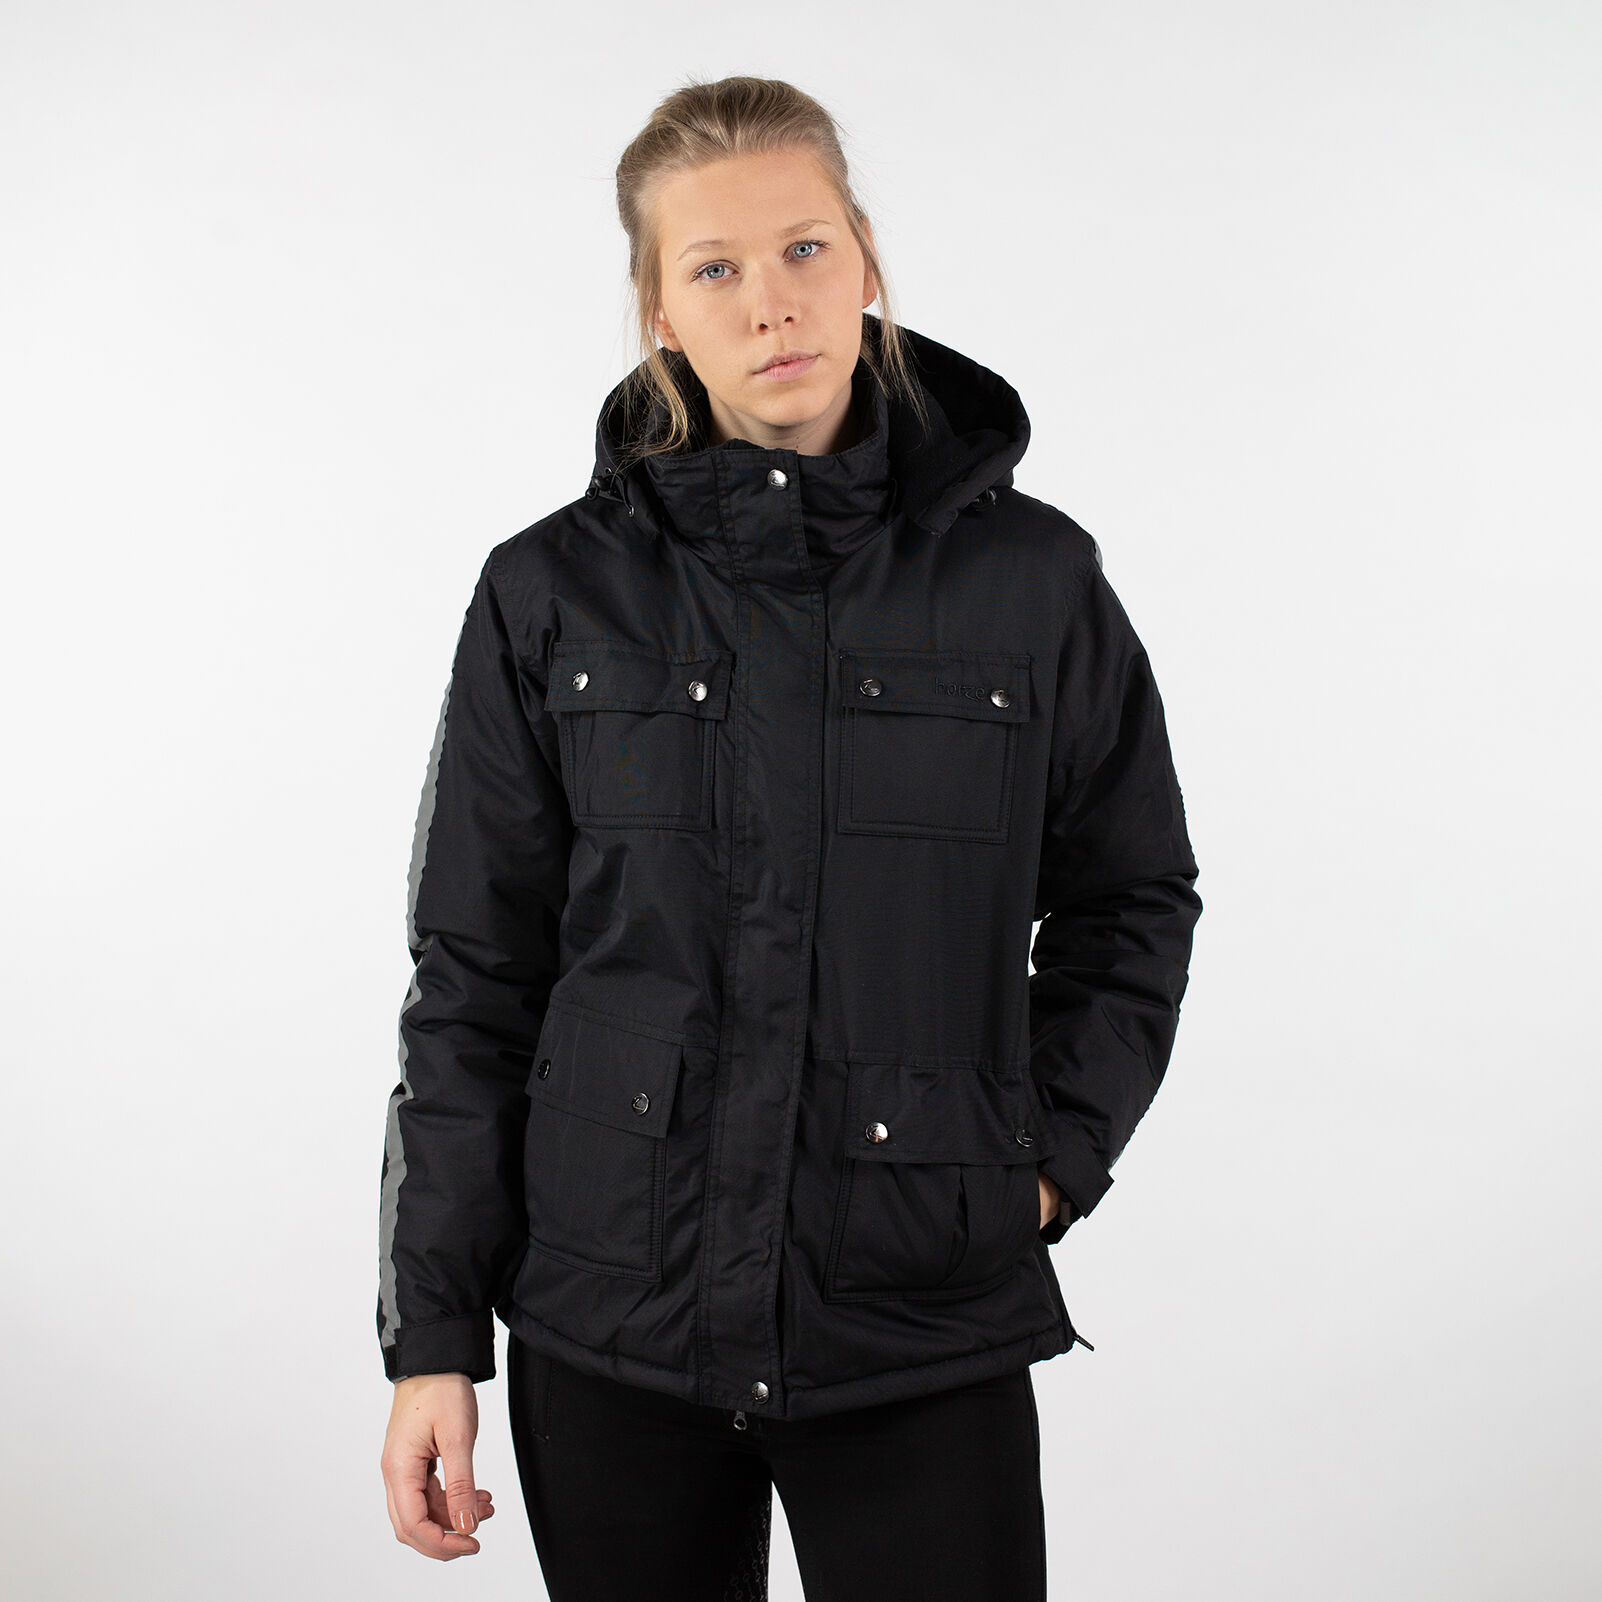 Horze WinterRider Winter Jacket Women